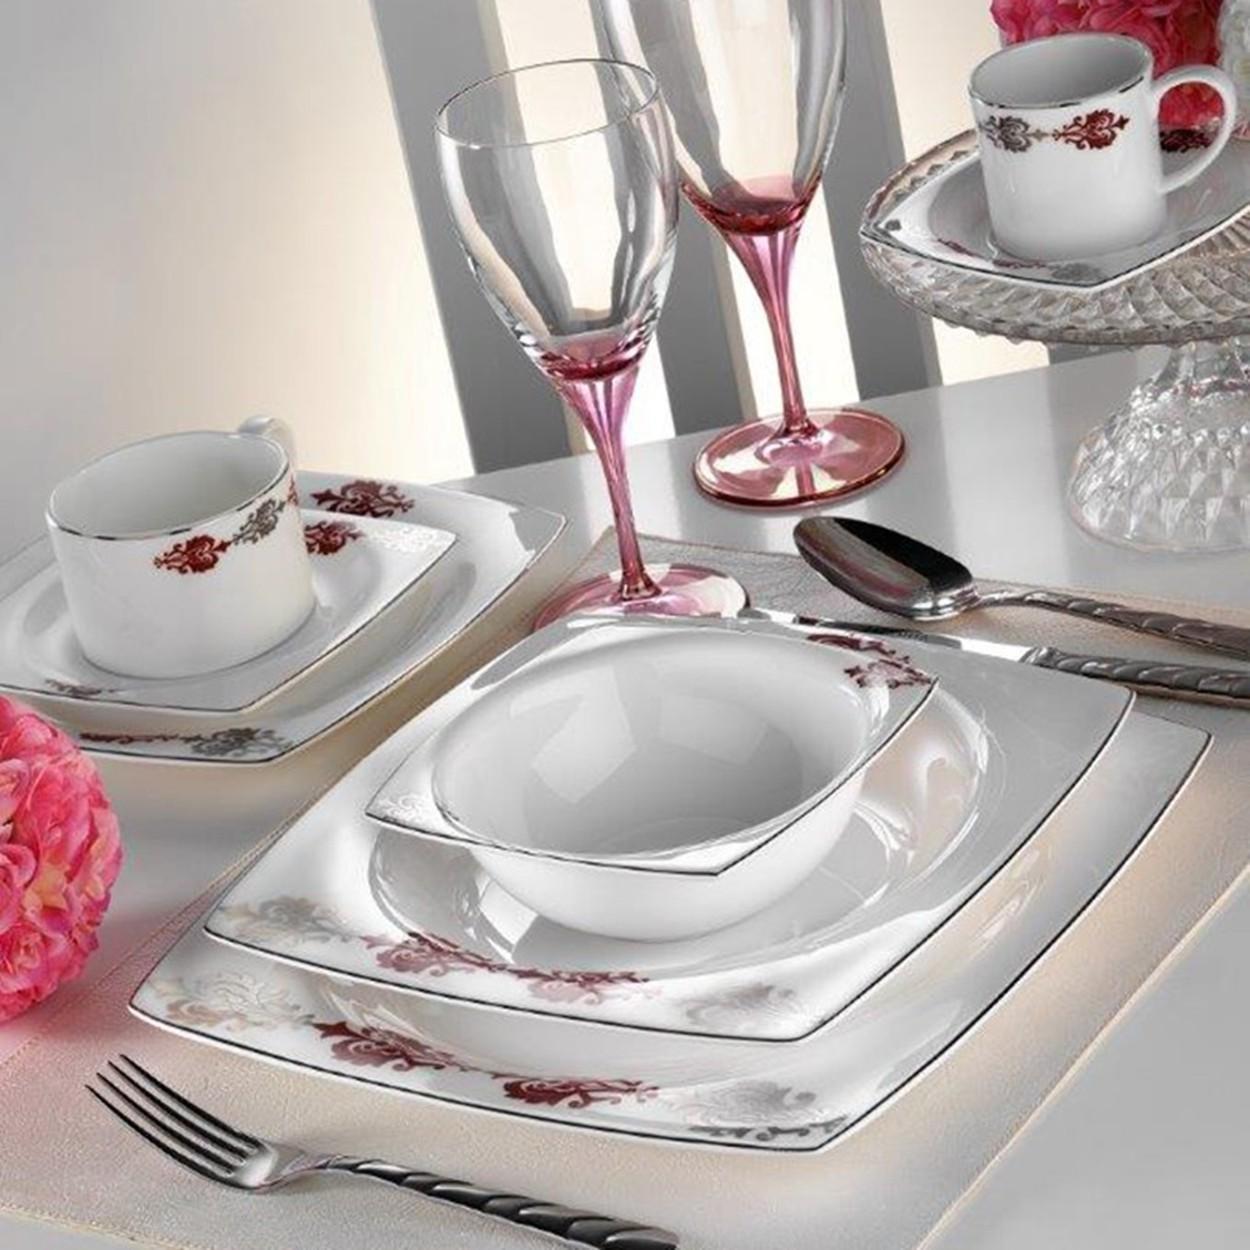 Kutahya Porselen KARE BONE 83 Pieces 60107 Patterned Dinnerware Set